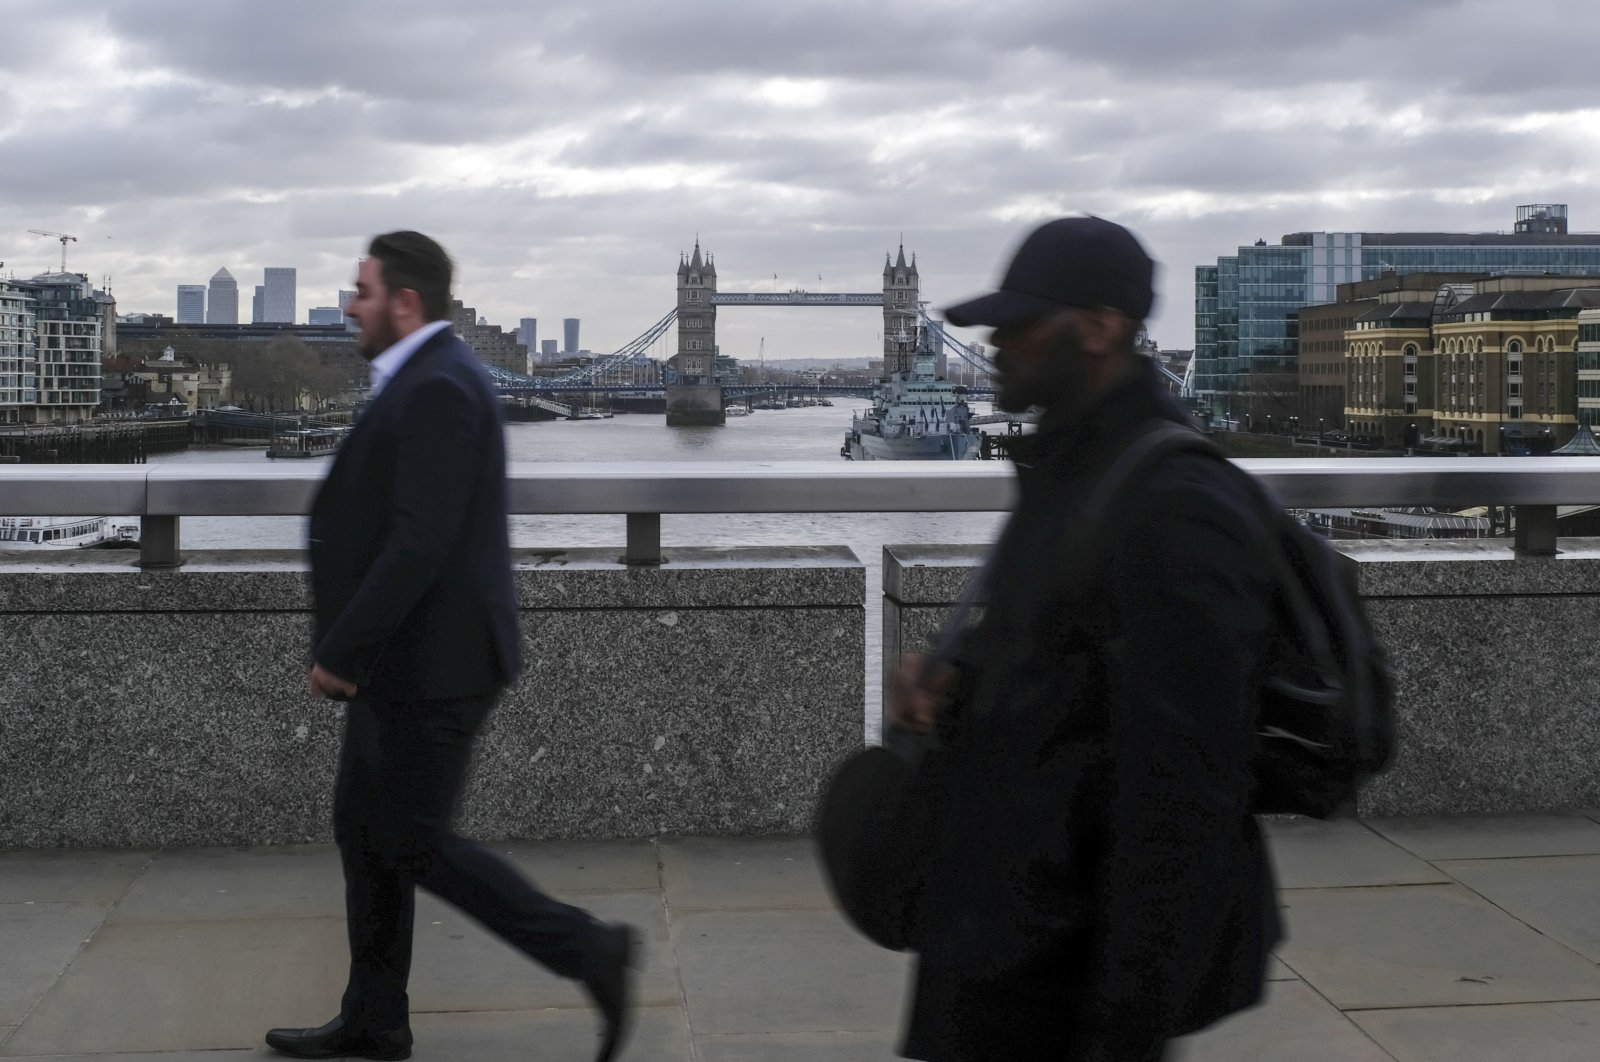 People commute across London Bridge, London, March 13, 2020. (AP Photo)